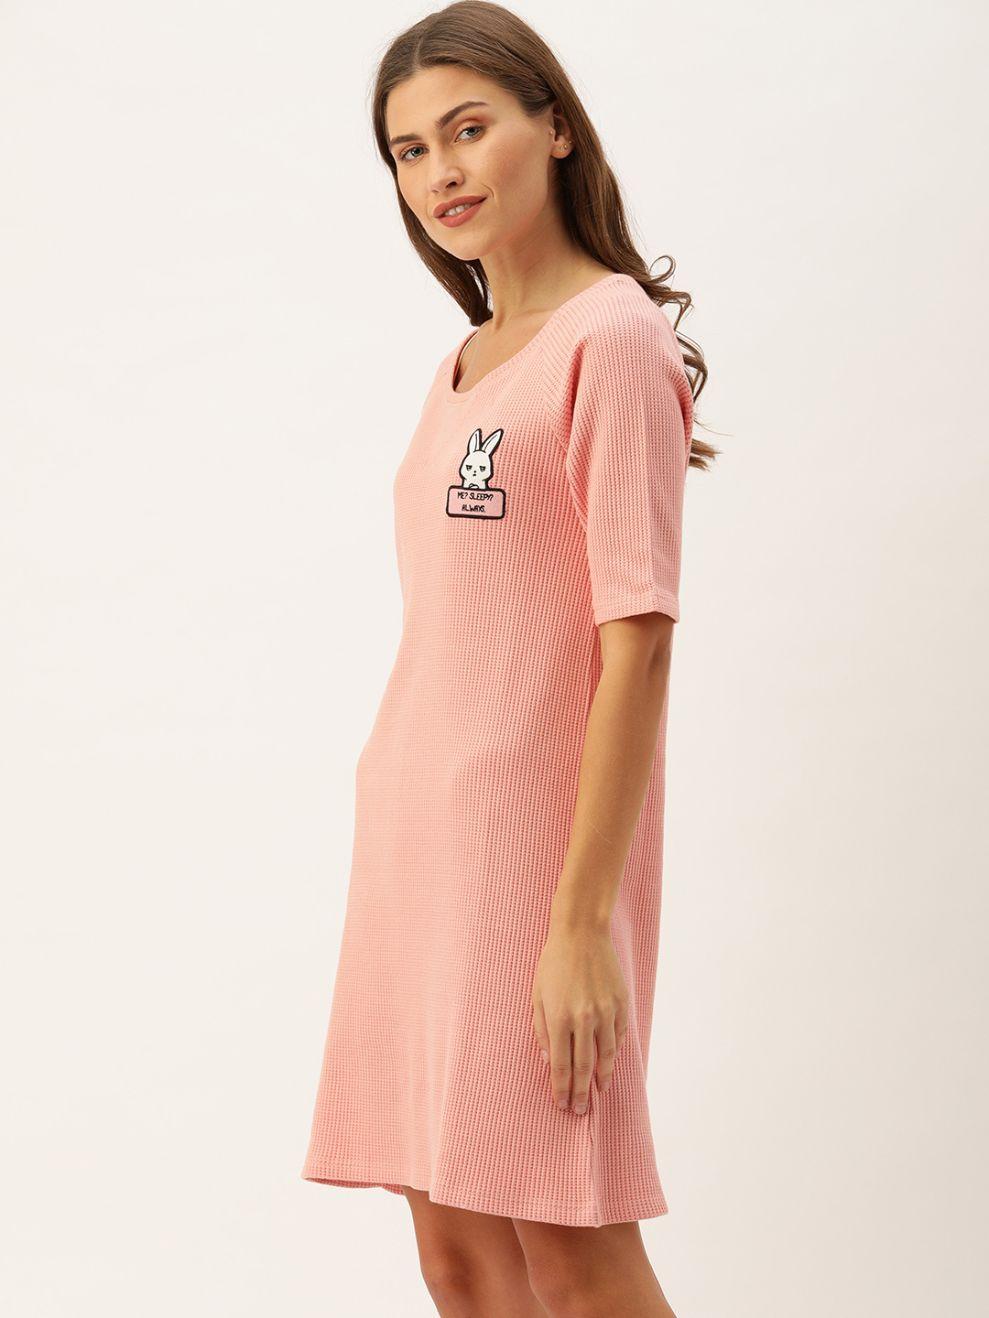 Slumber Jill Winter Waffle Rose Pink Lounge Dress